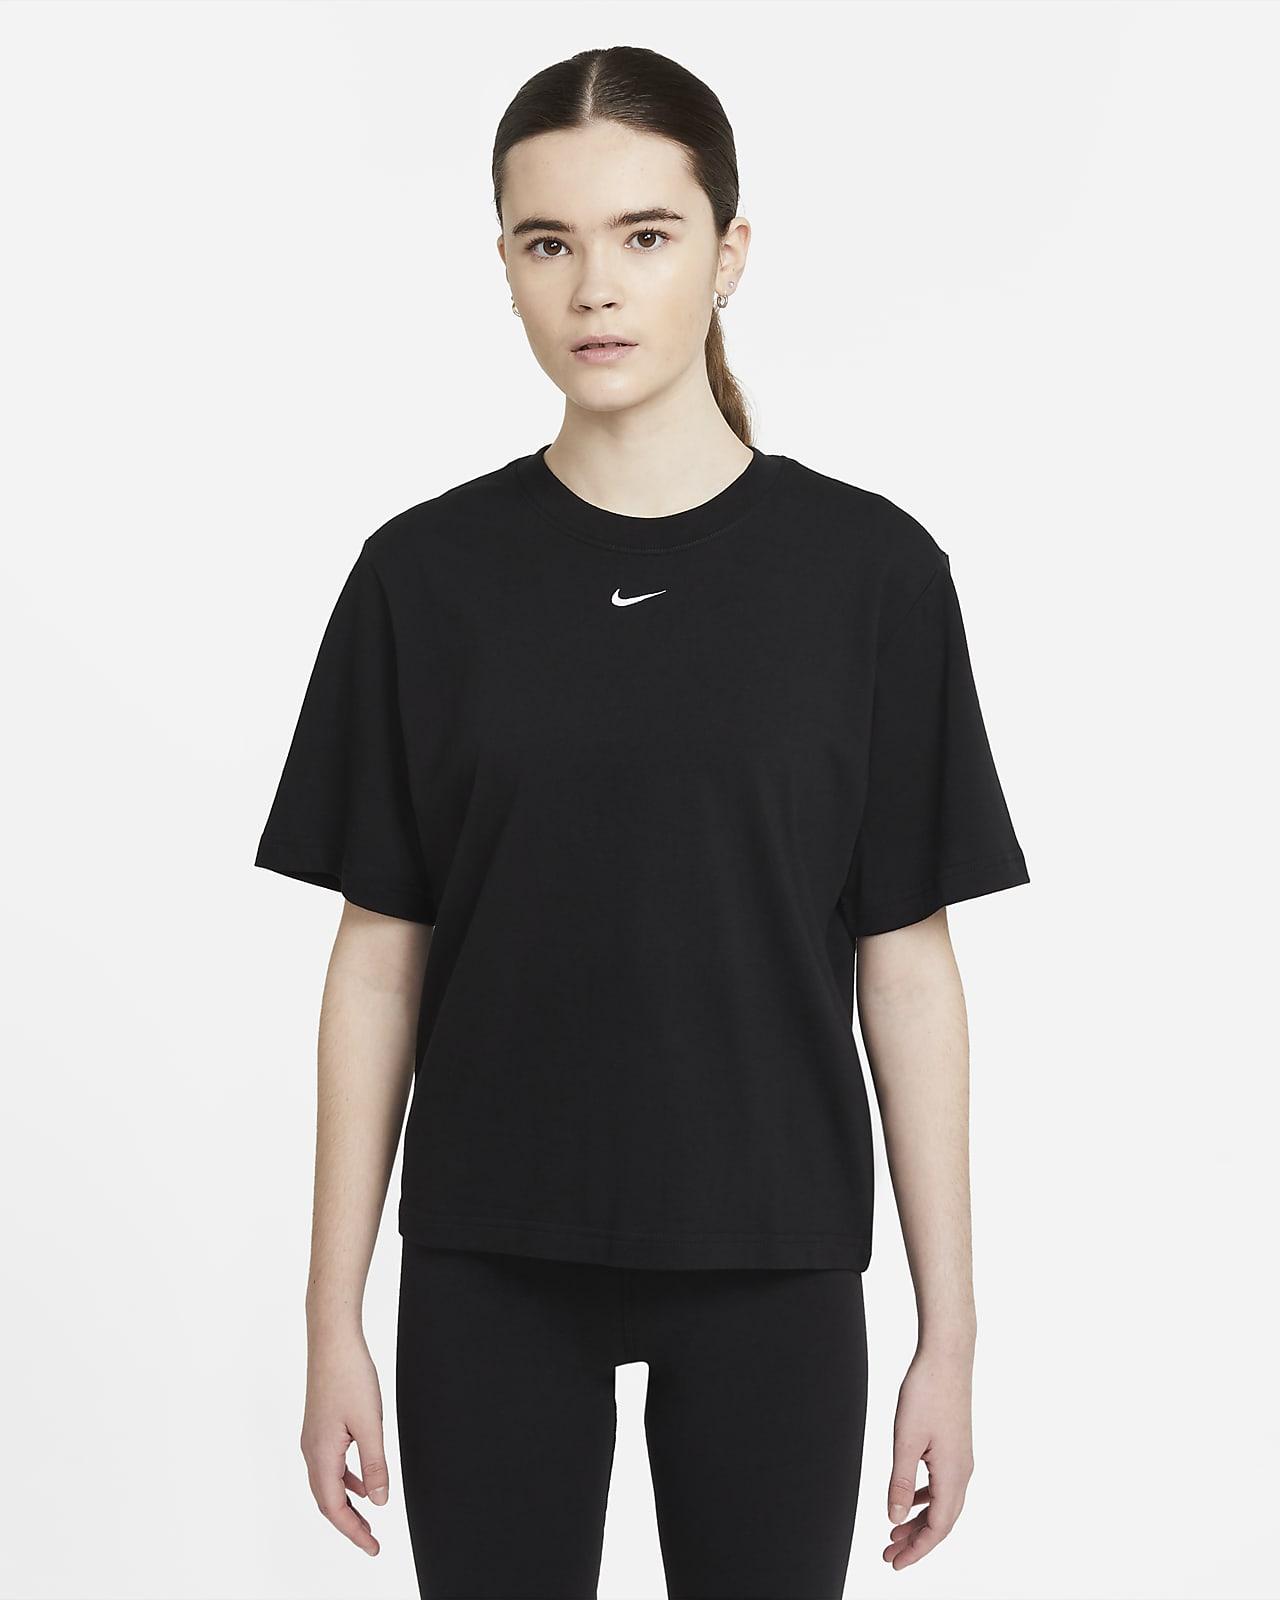 Nike Sportswear Essential Women's Boxy T-Shirt